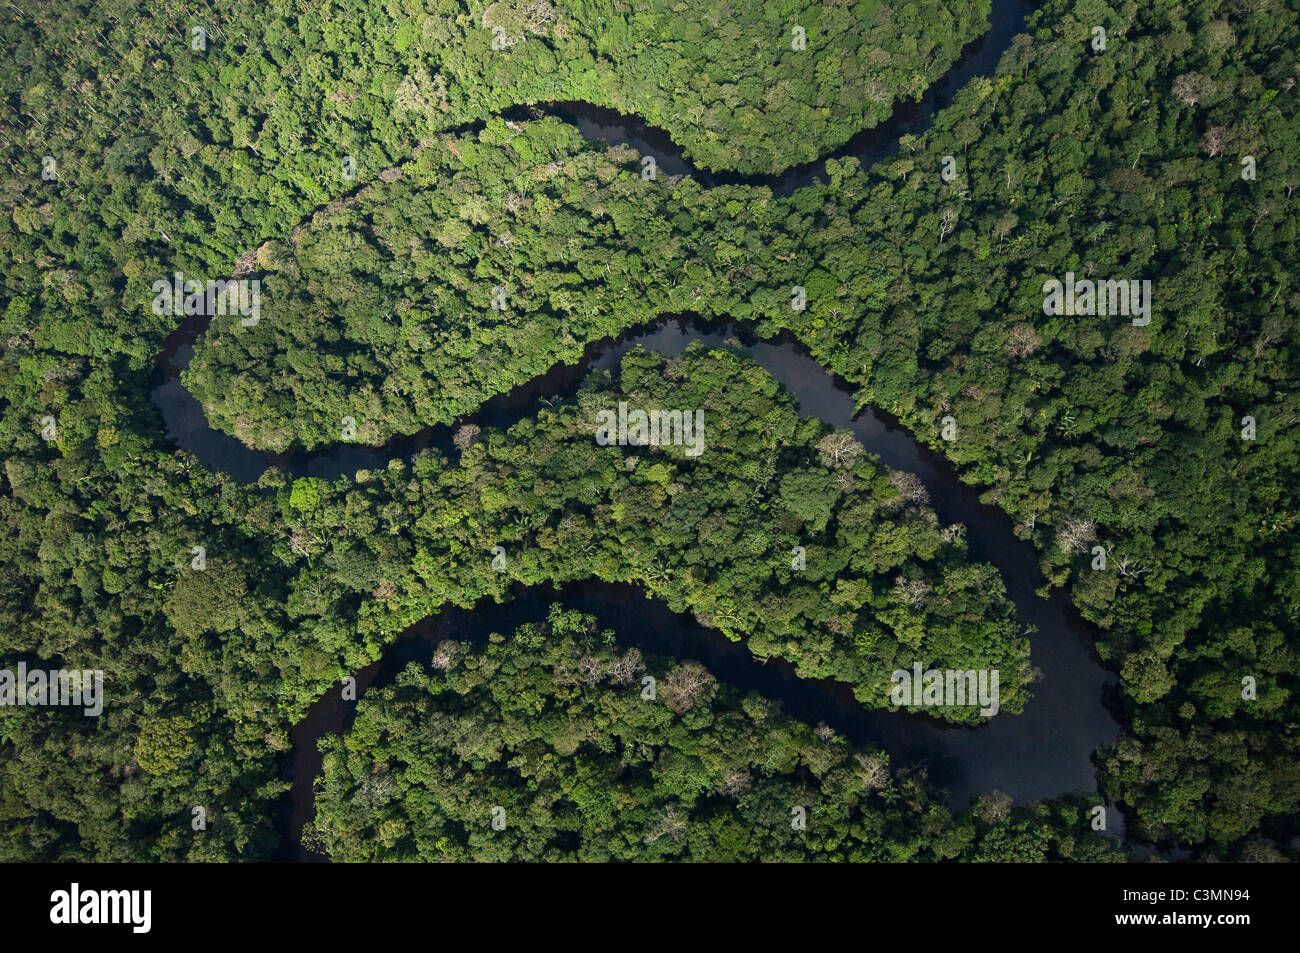 Meandering river in Cuyabeno Reserve., Amazonasregenwald. - Stock Image